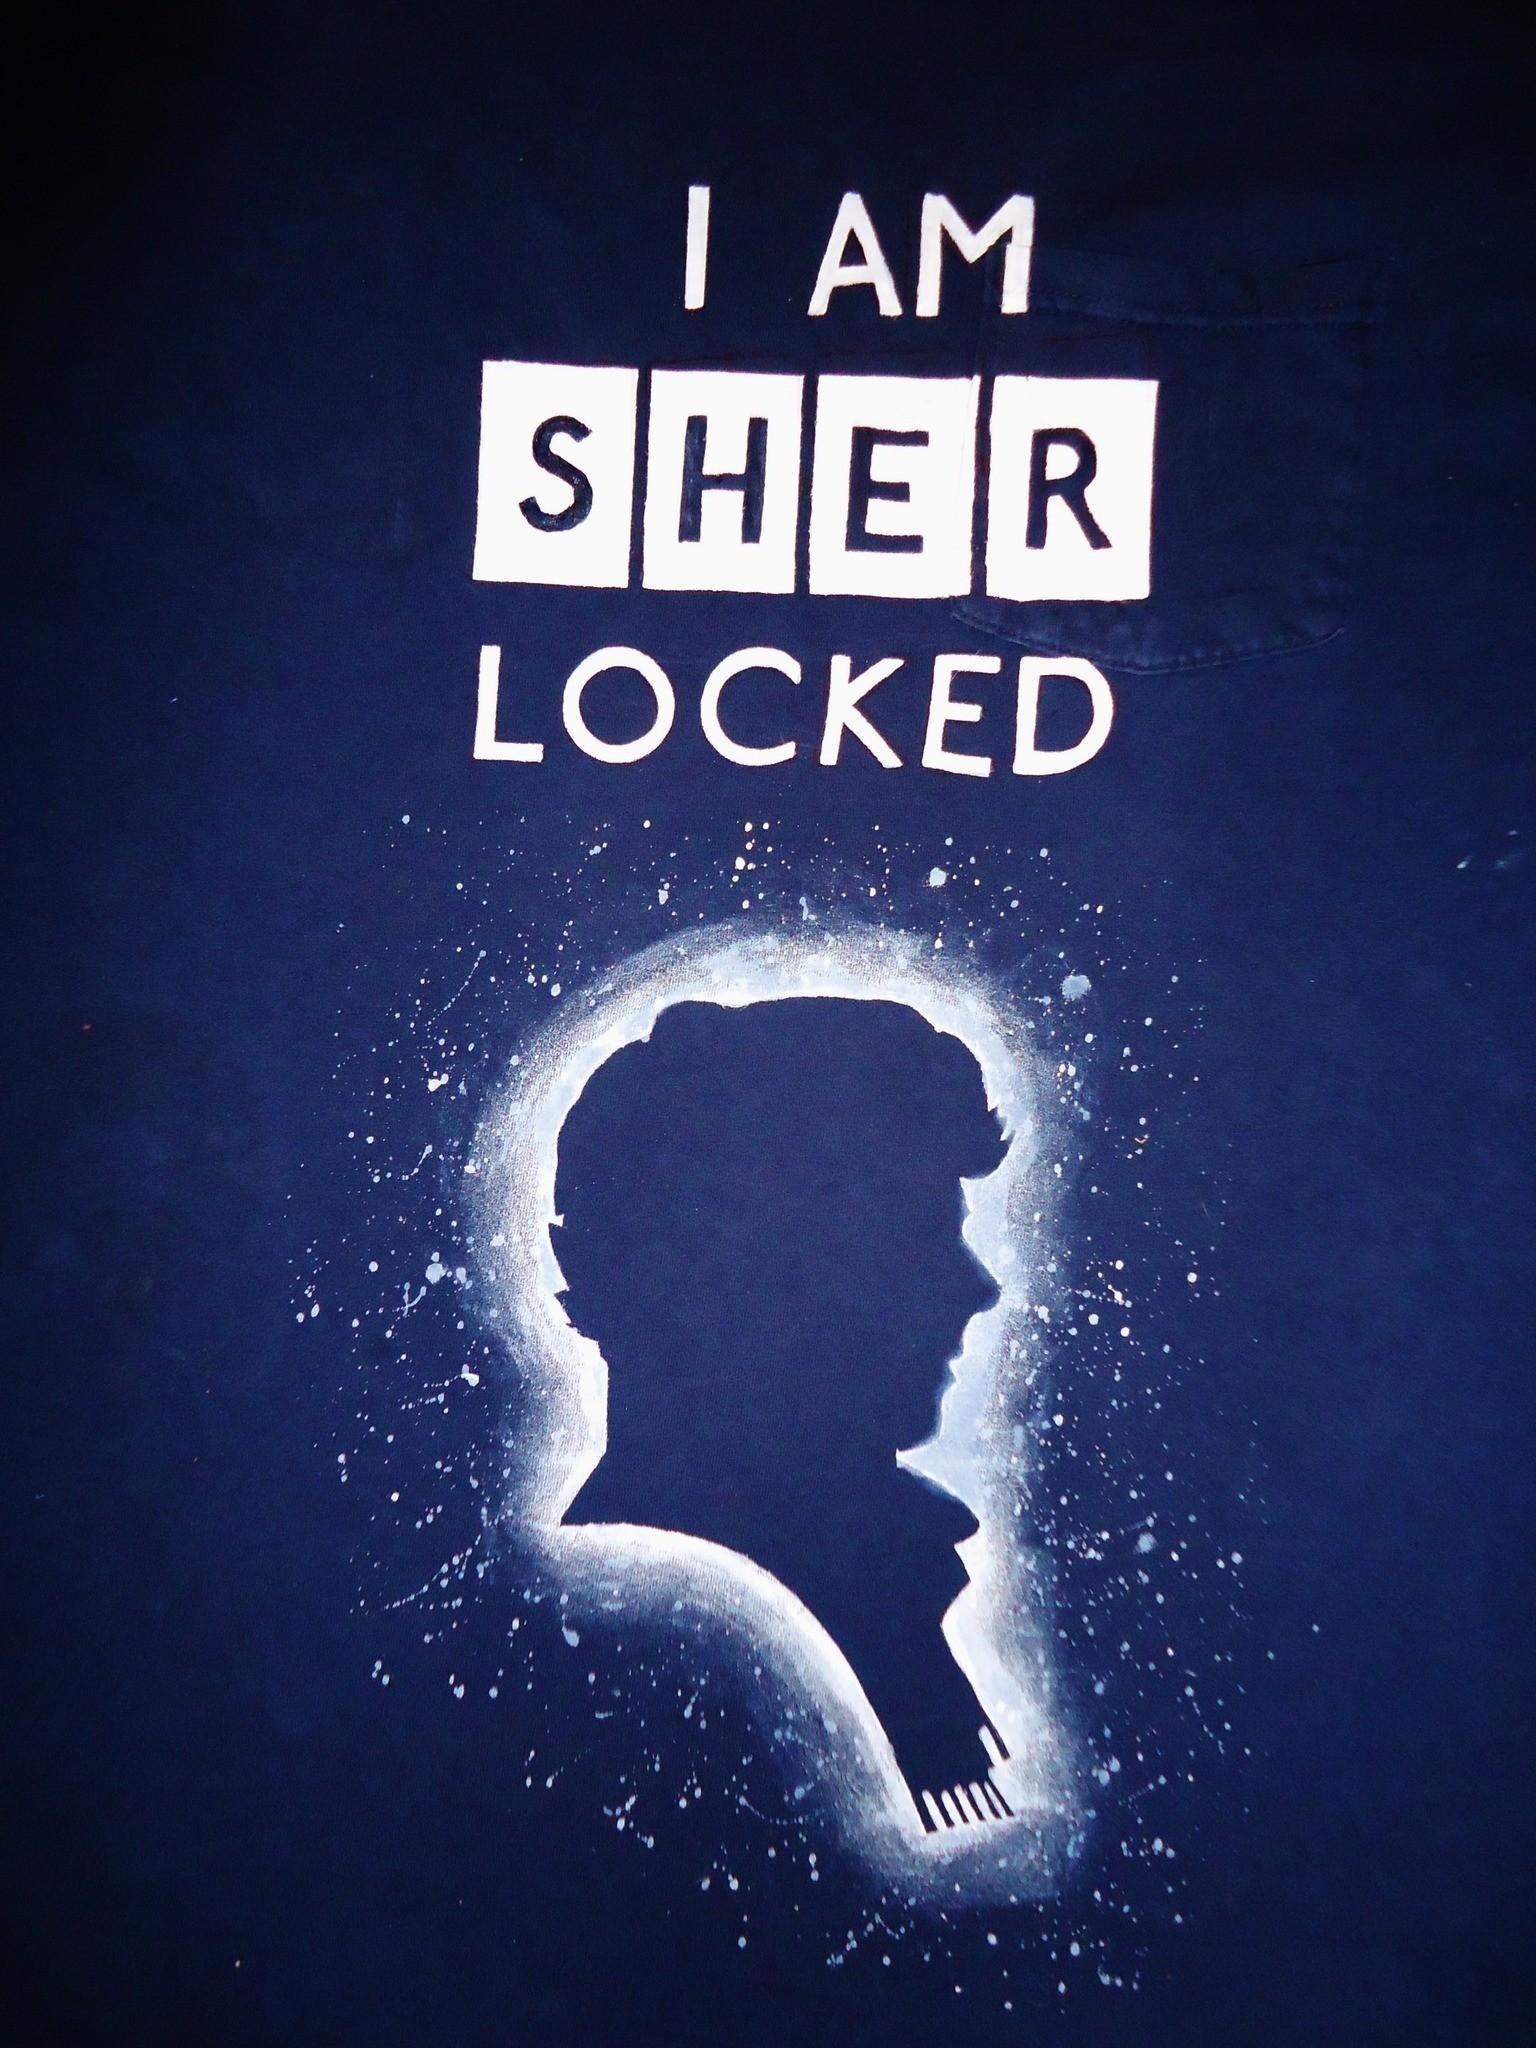 I Am Sherlocked Wallpaper 73 Images